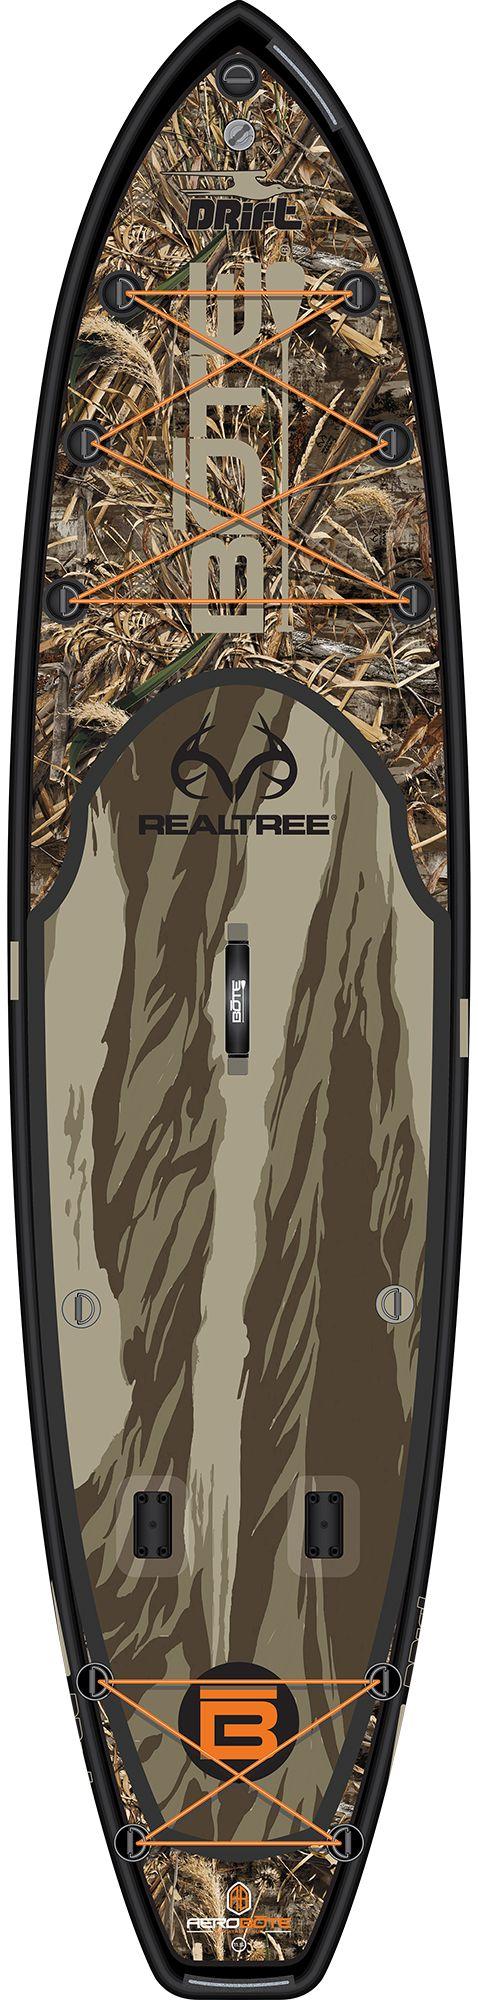 Realtree Camo Bote Drift Paddle Board